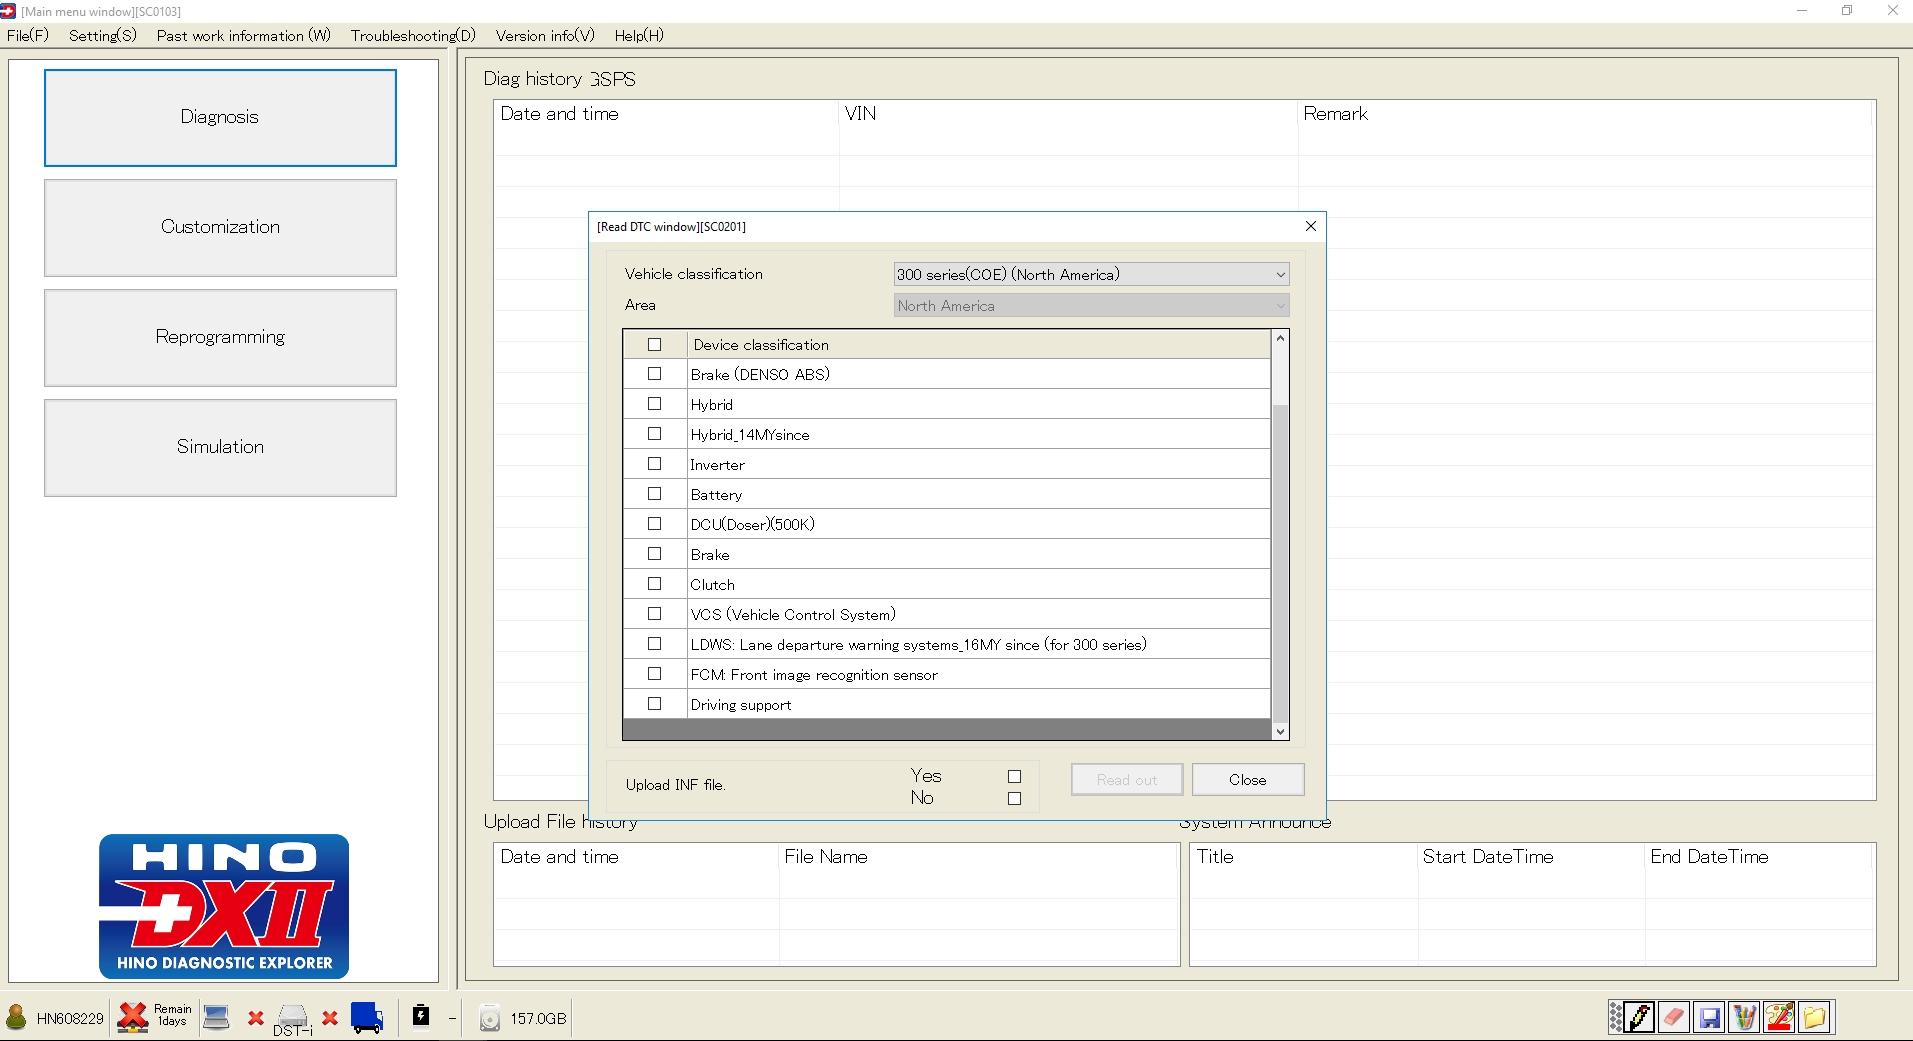 HINO_Diagnostic_eXplorer_DX2_11207_072020_Diagnostic_Software_6